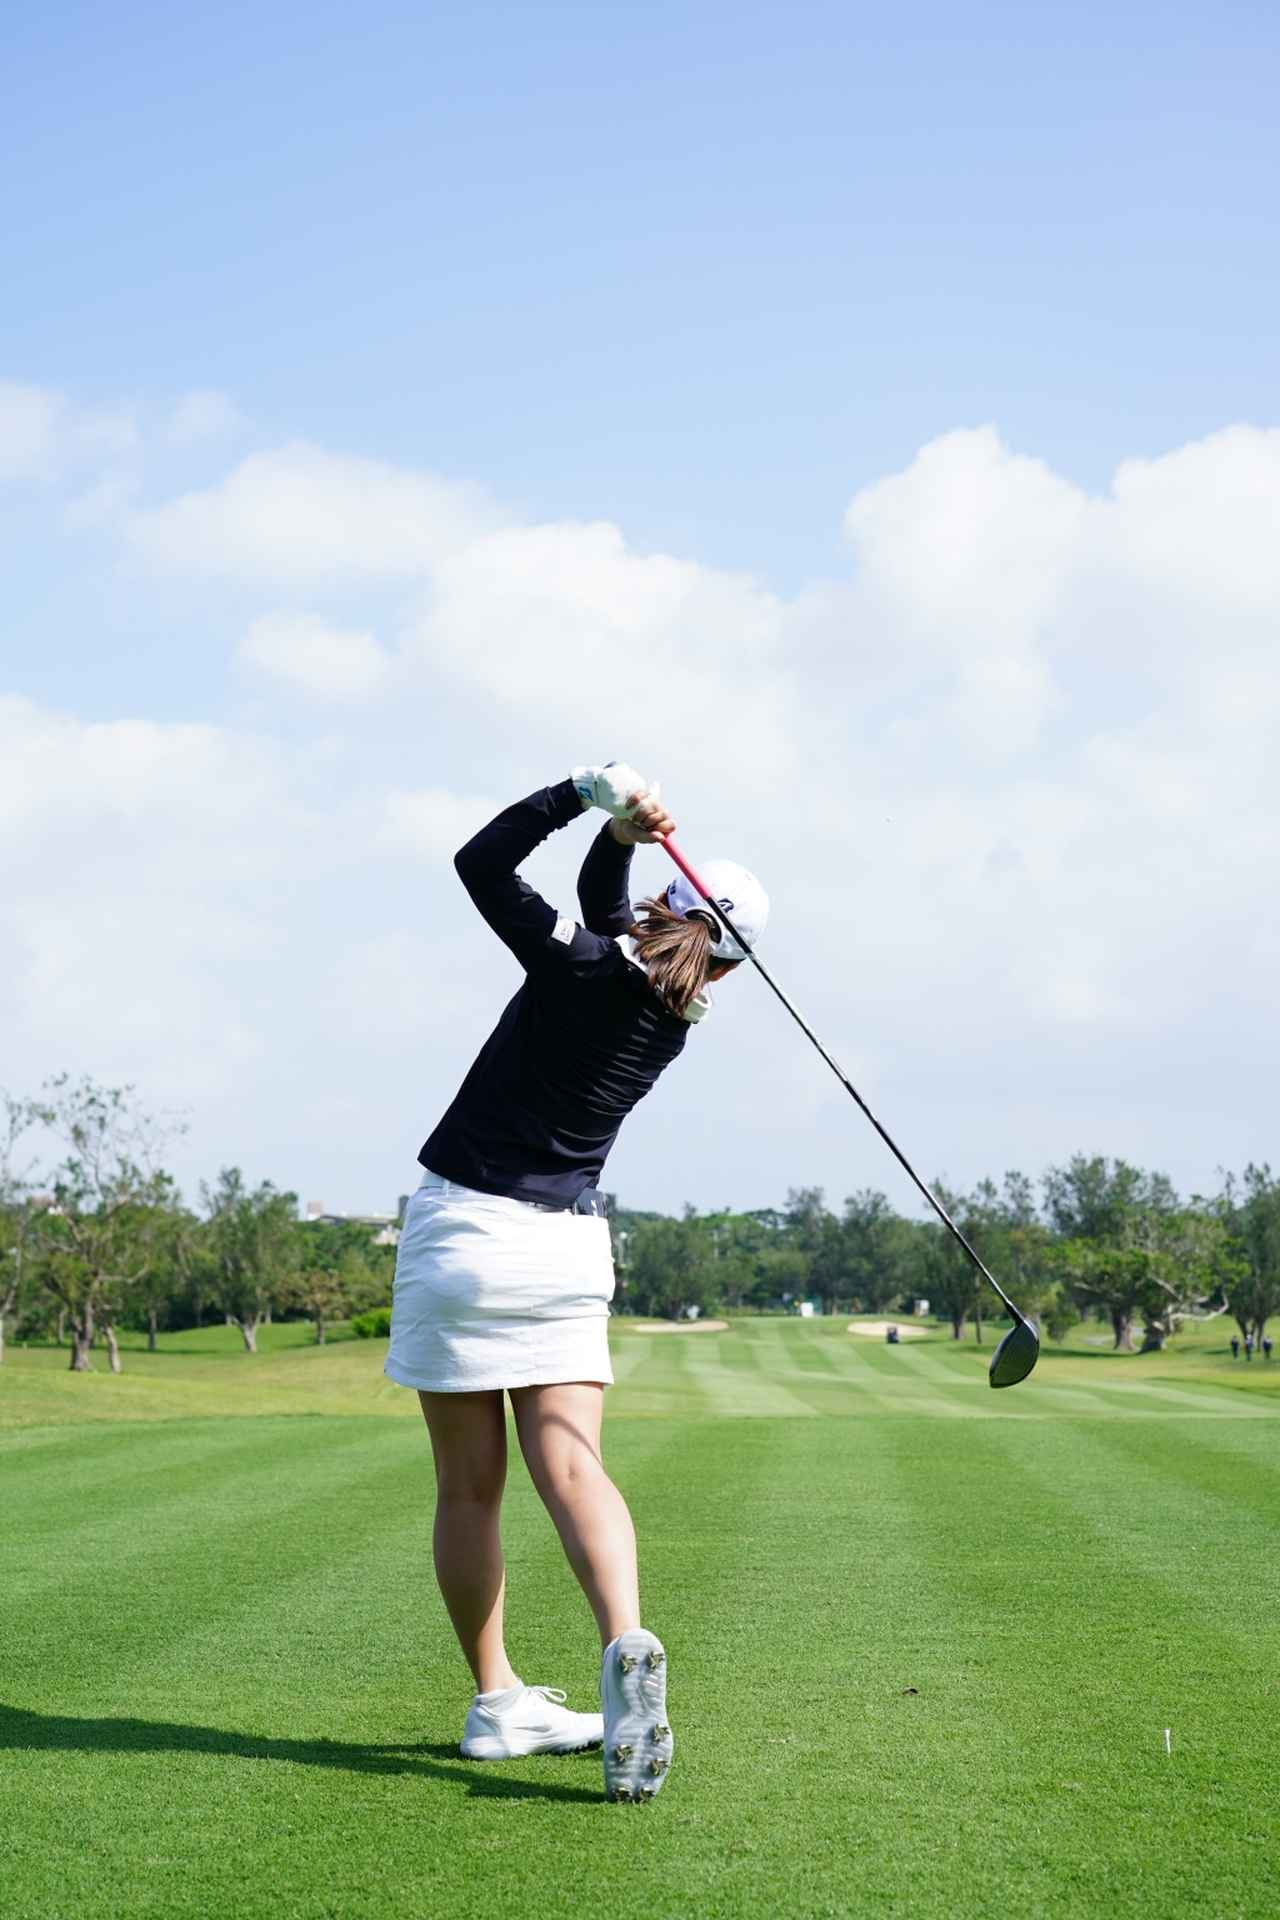 Images : 19番目の画像 - 丹萌乃のドライバー連続写真 - みんなのゴルフダイジェスト